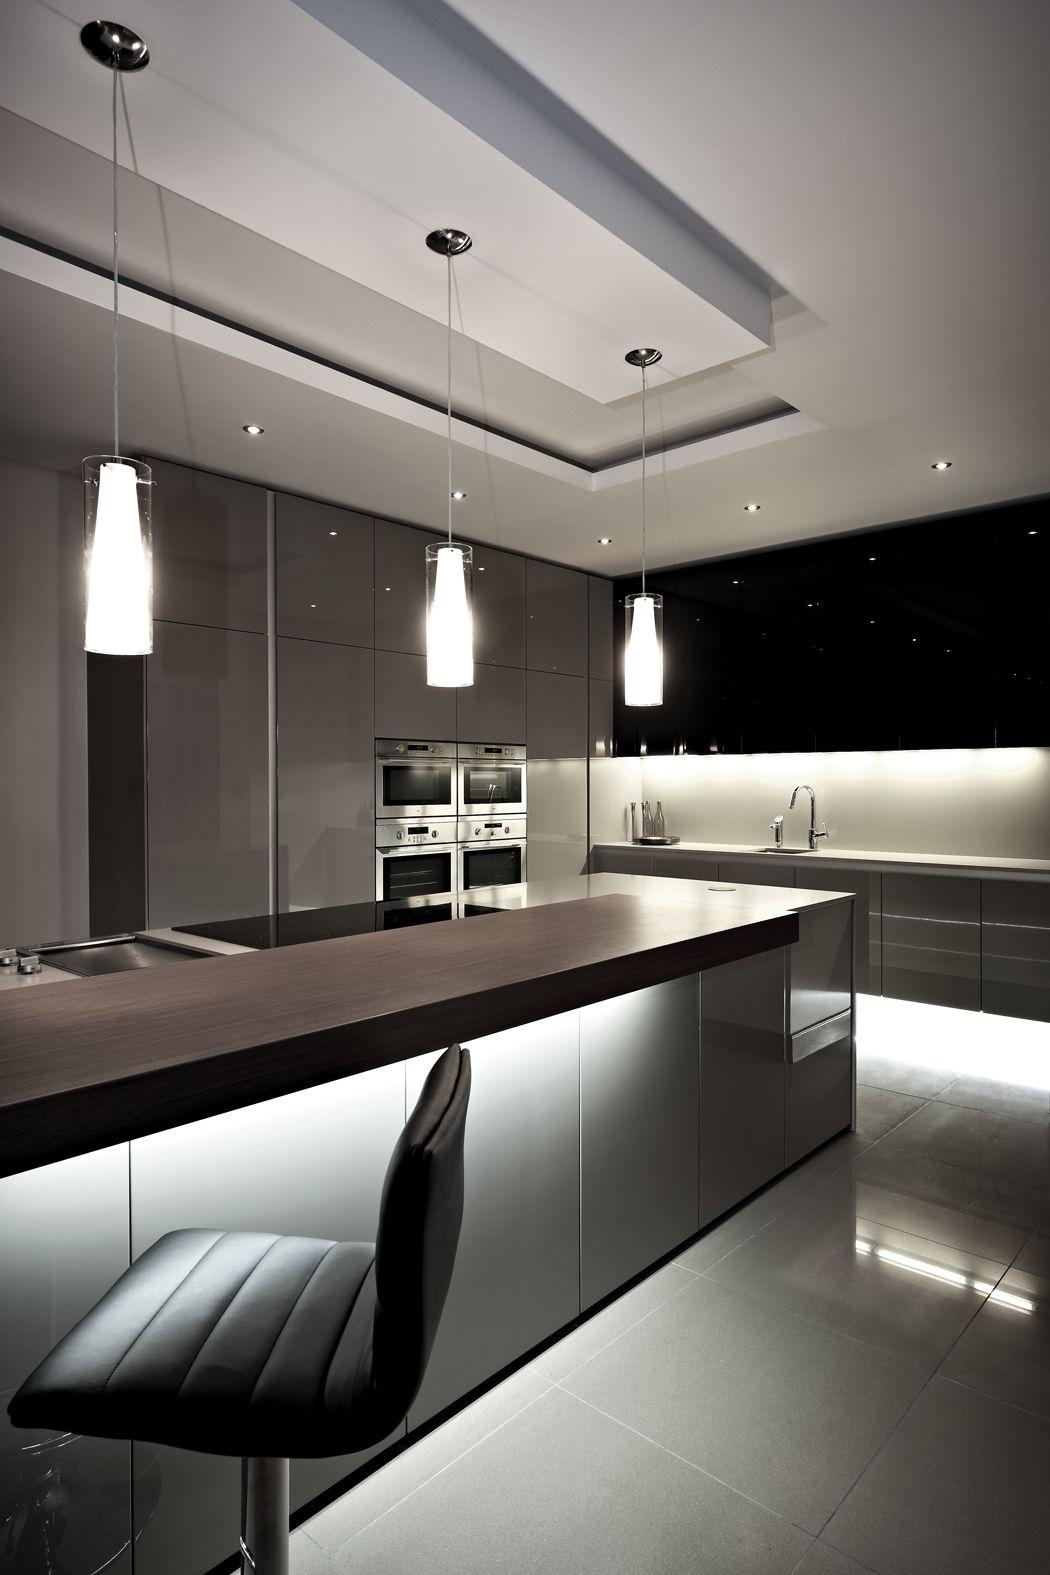 blu_line kitchens ebotse estate in 2019 Kitchen